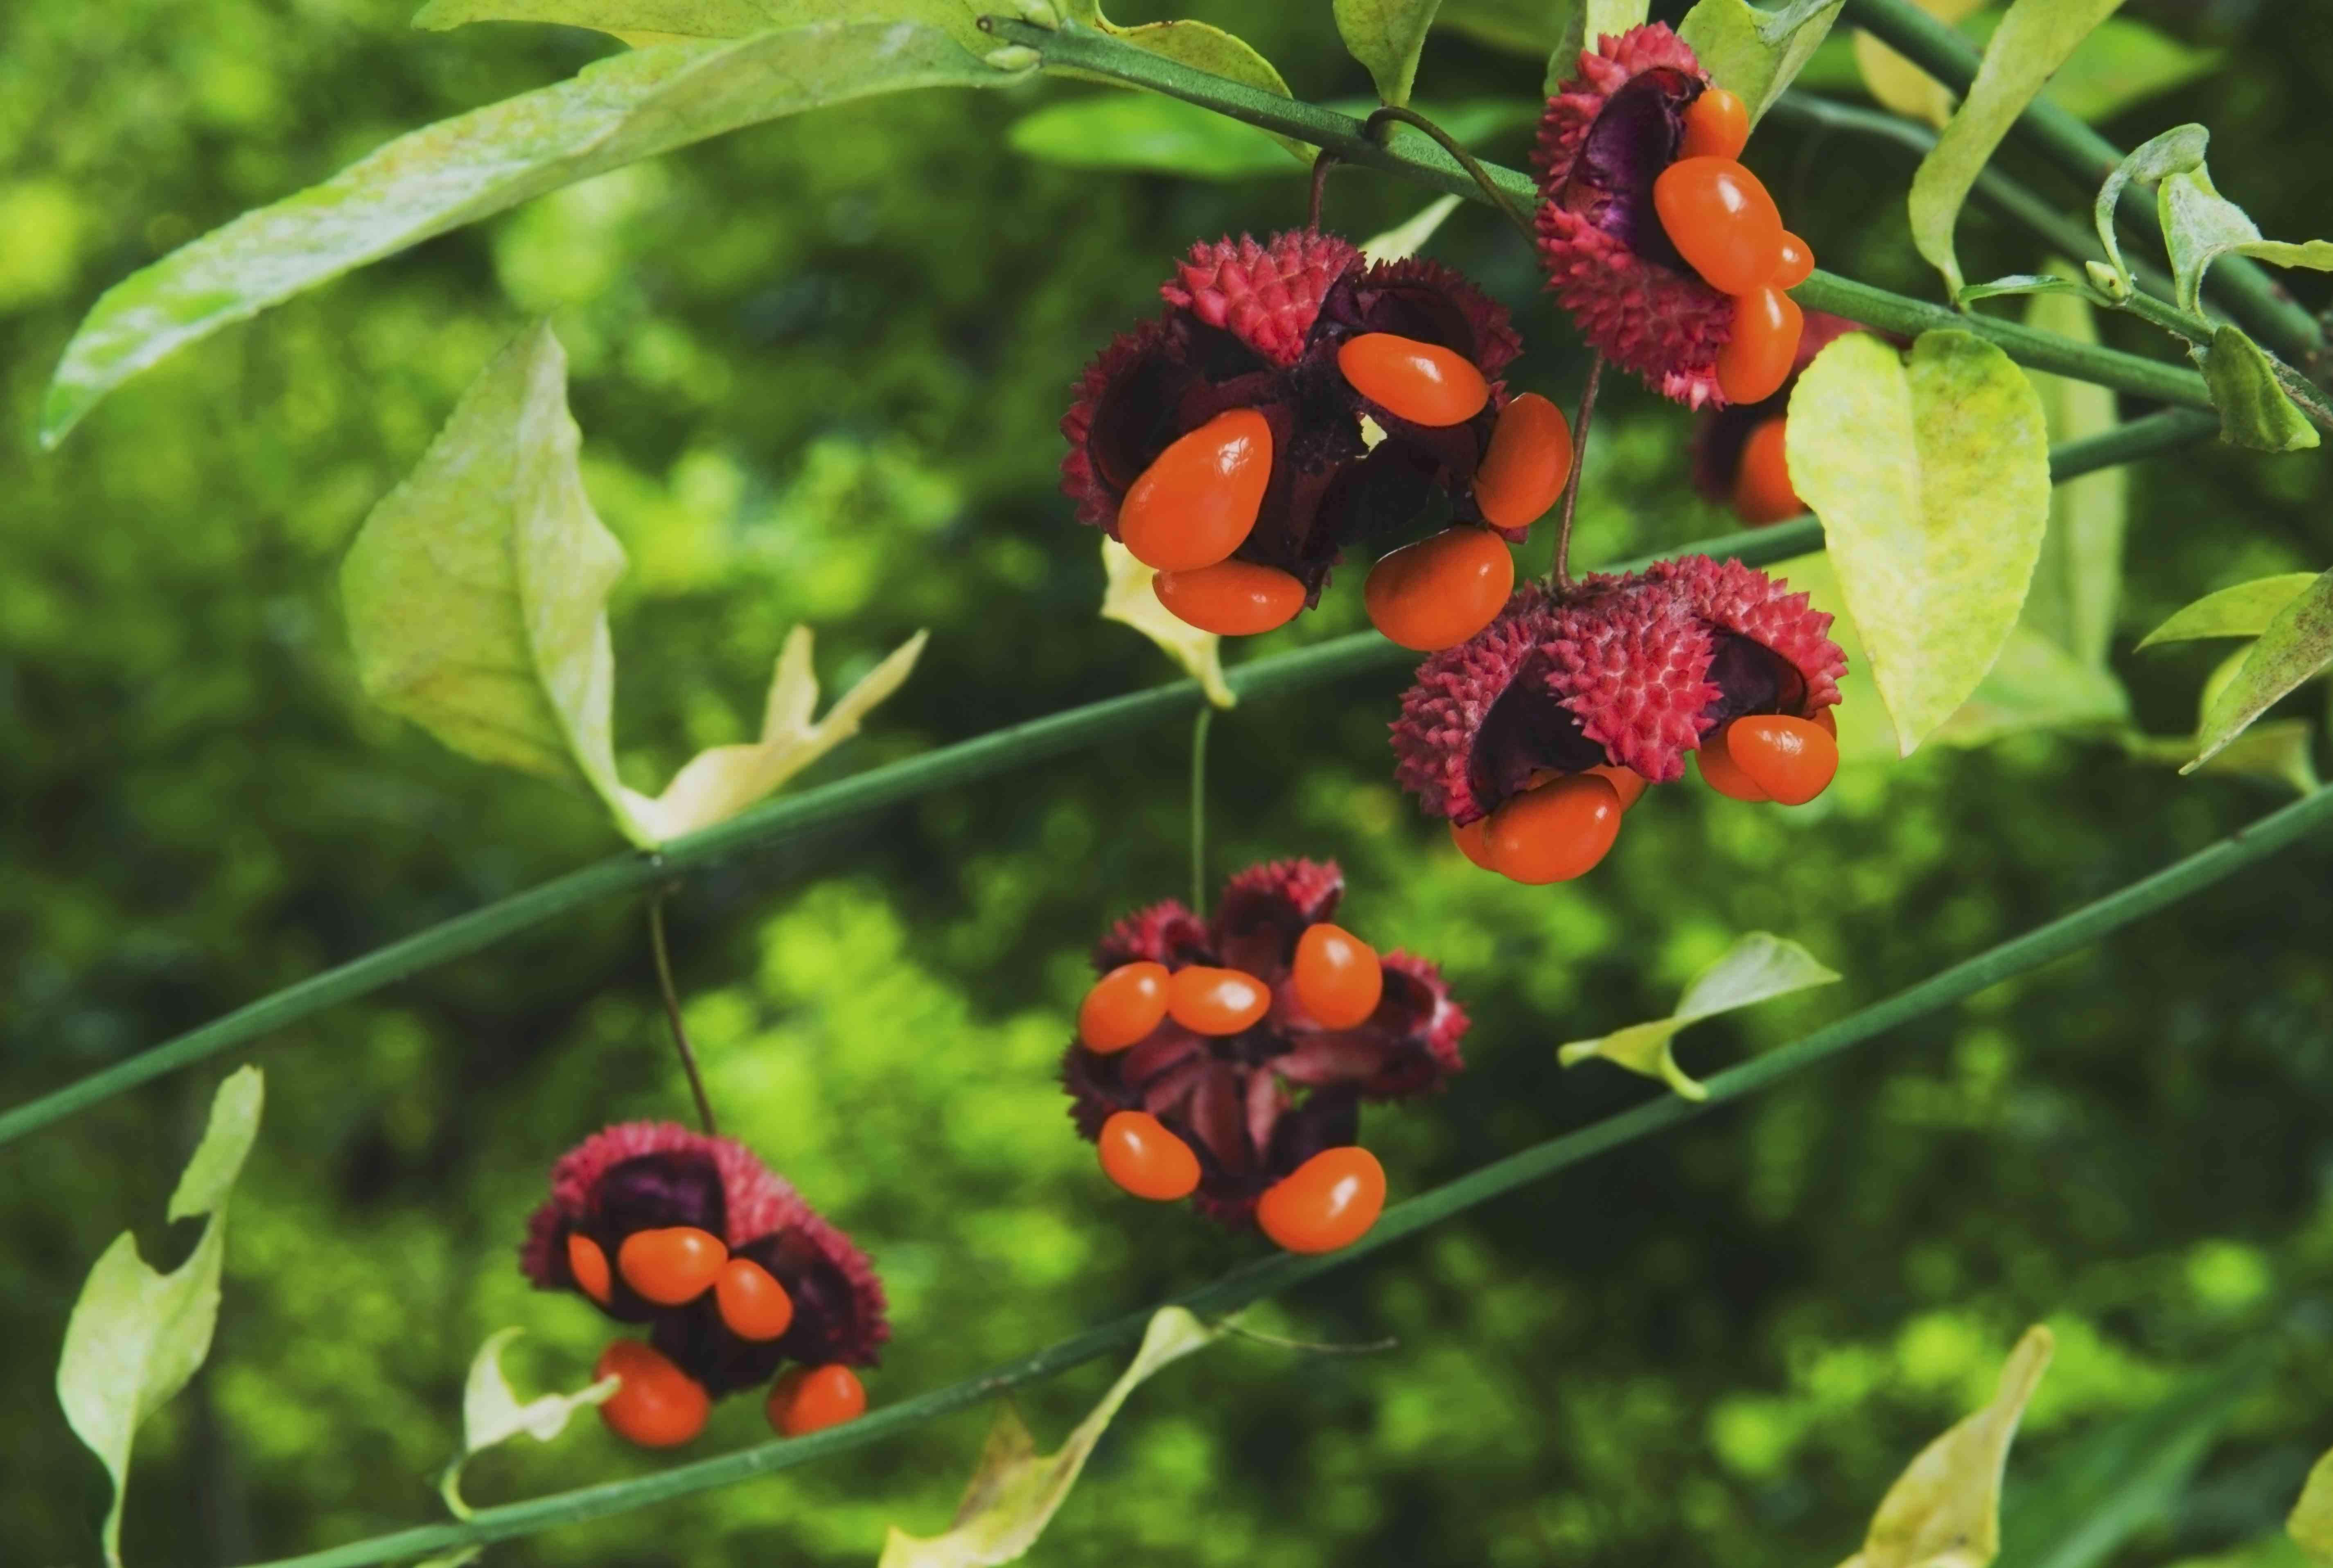 Bursting Hearts (Euonymus Americanus) Fruit Breaking Open In The Fall